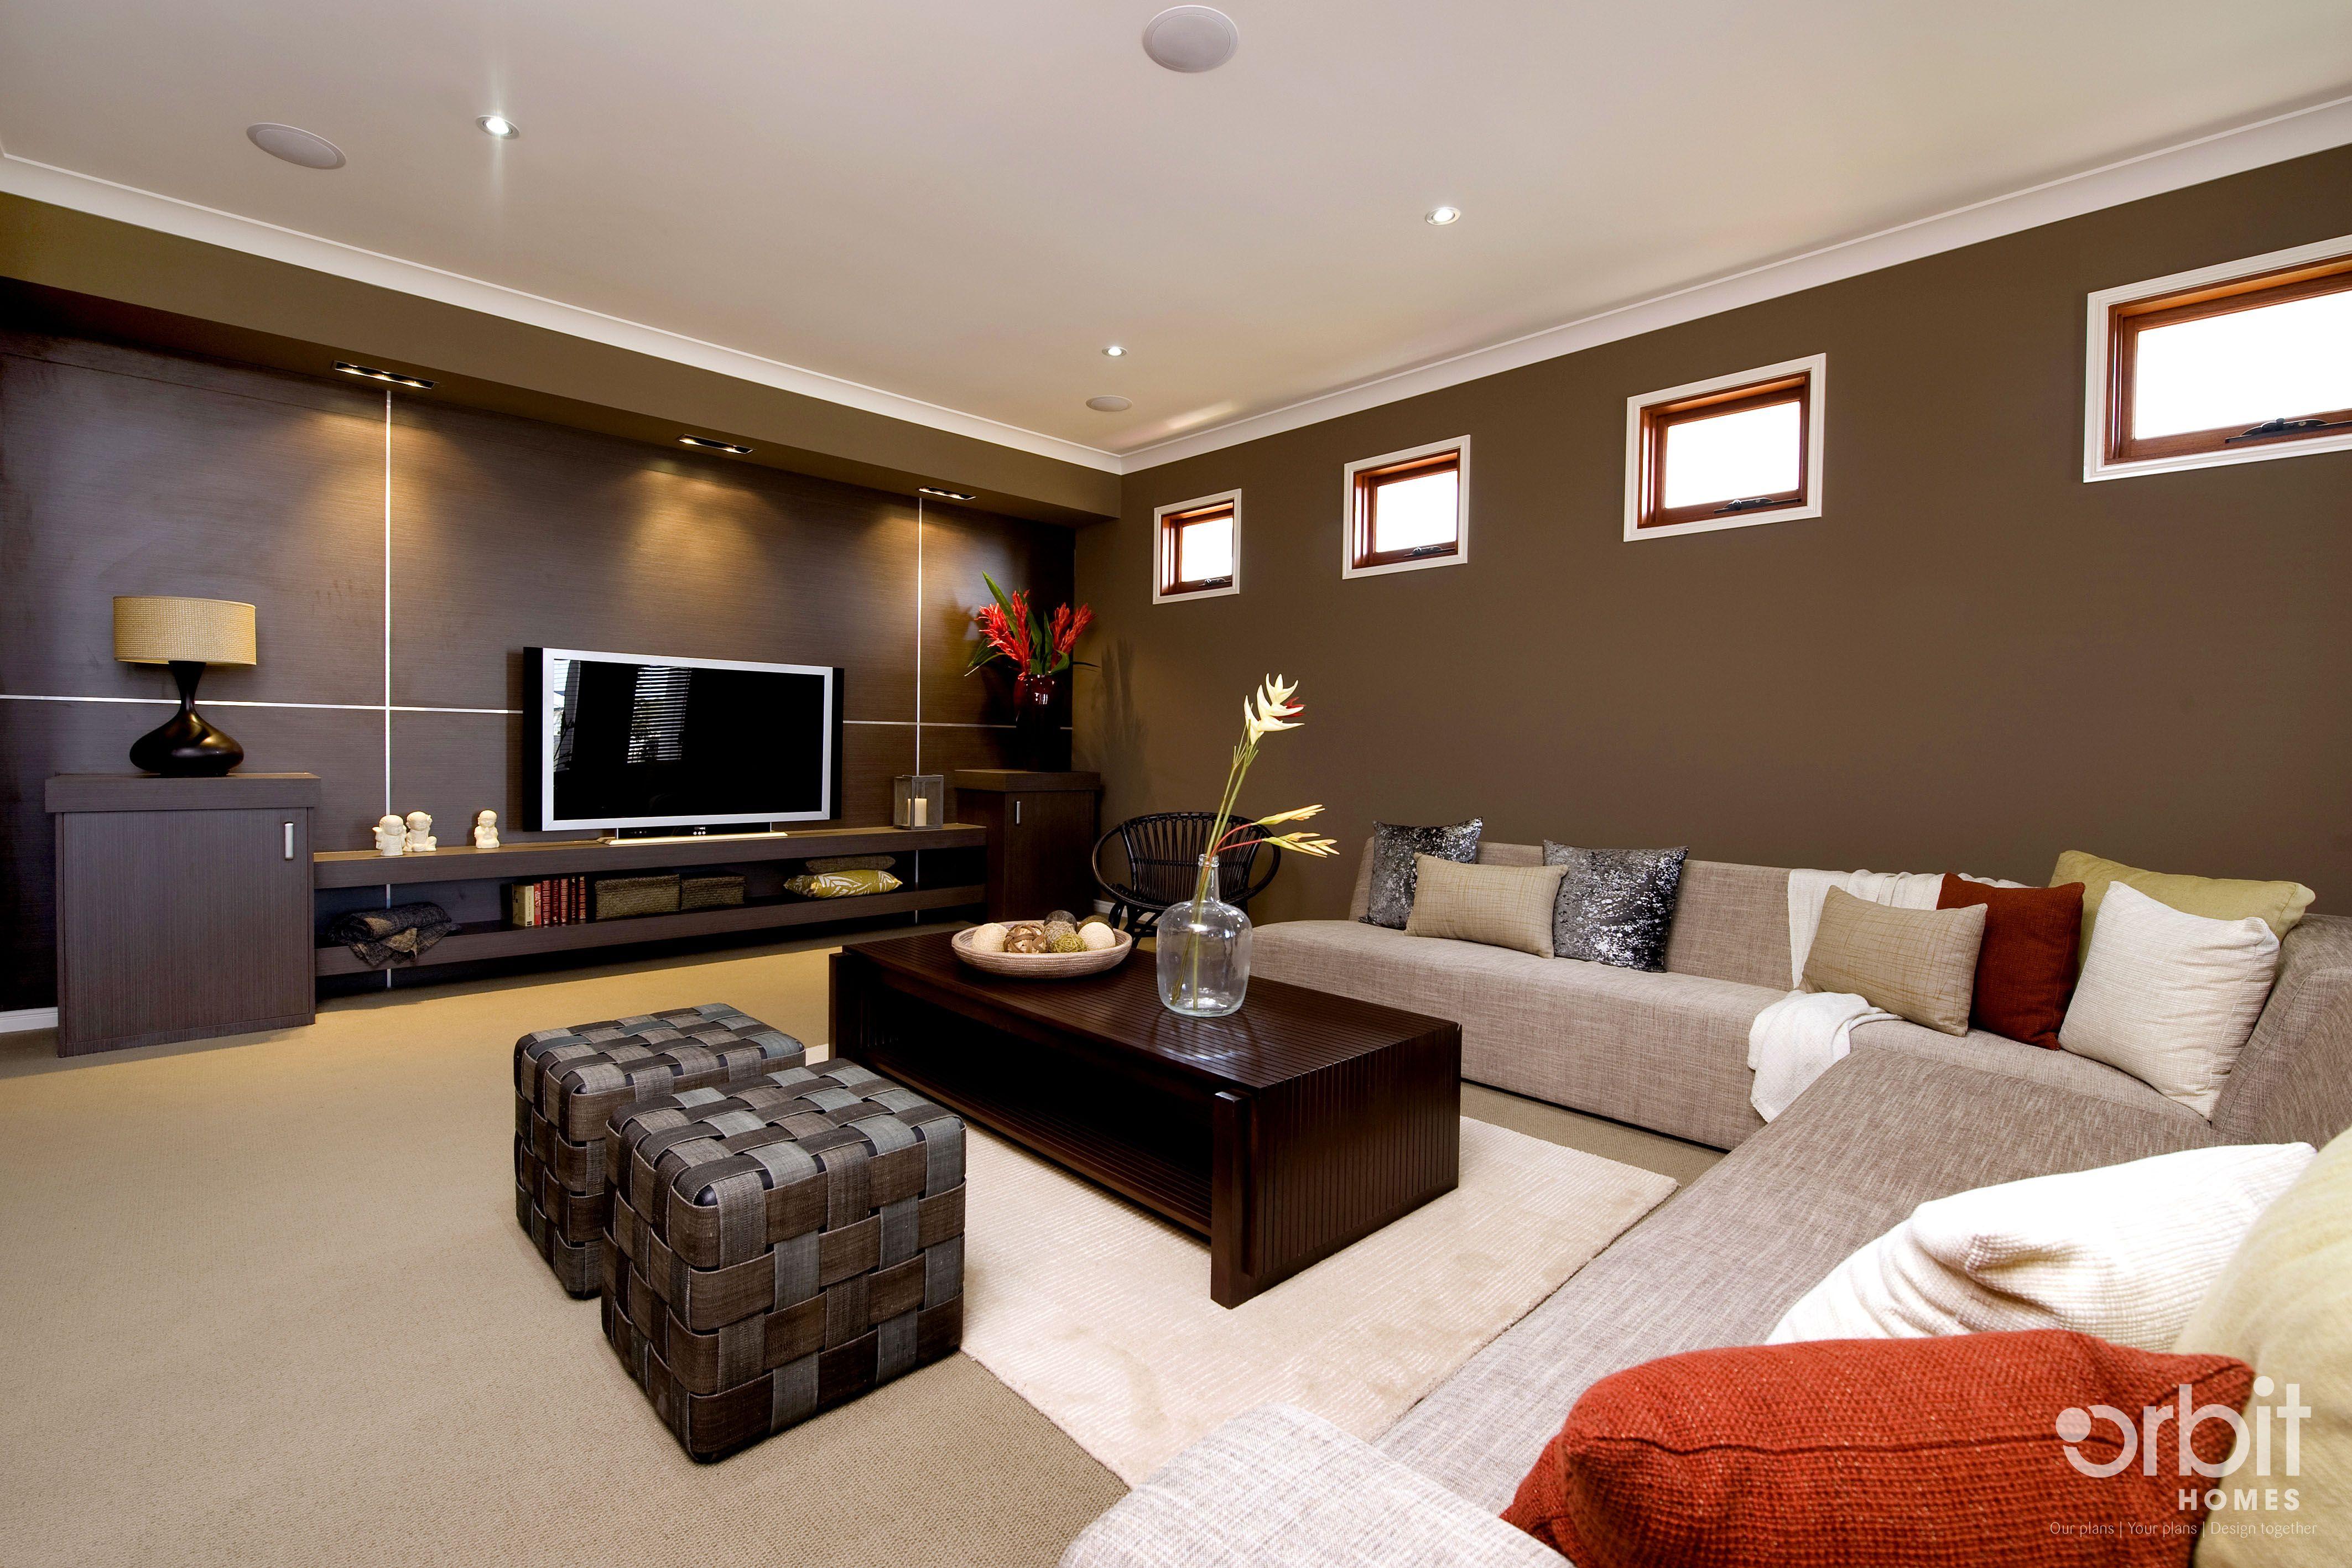 Orbit Homes Oasis 33 Lounge Room. EXTRA COMFORT ZONE